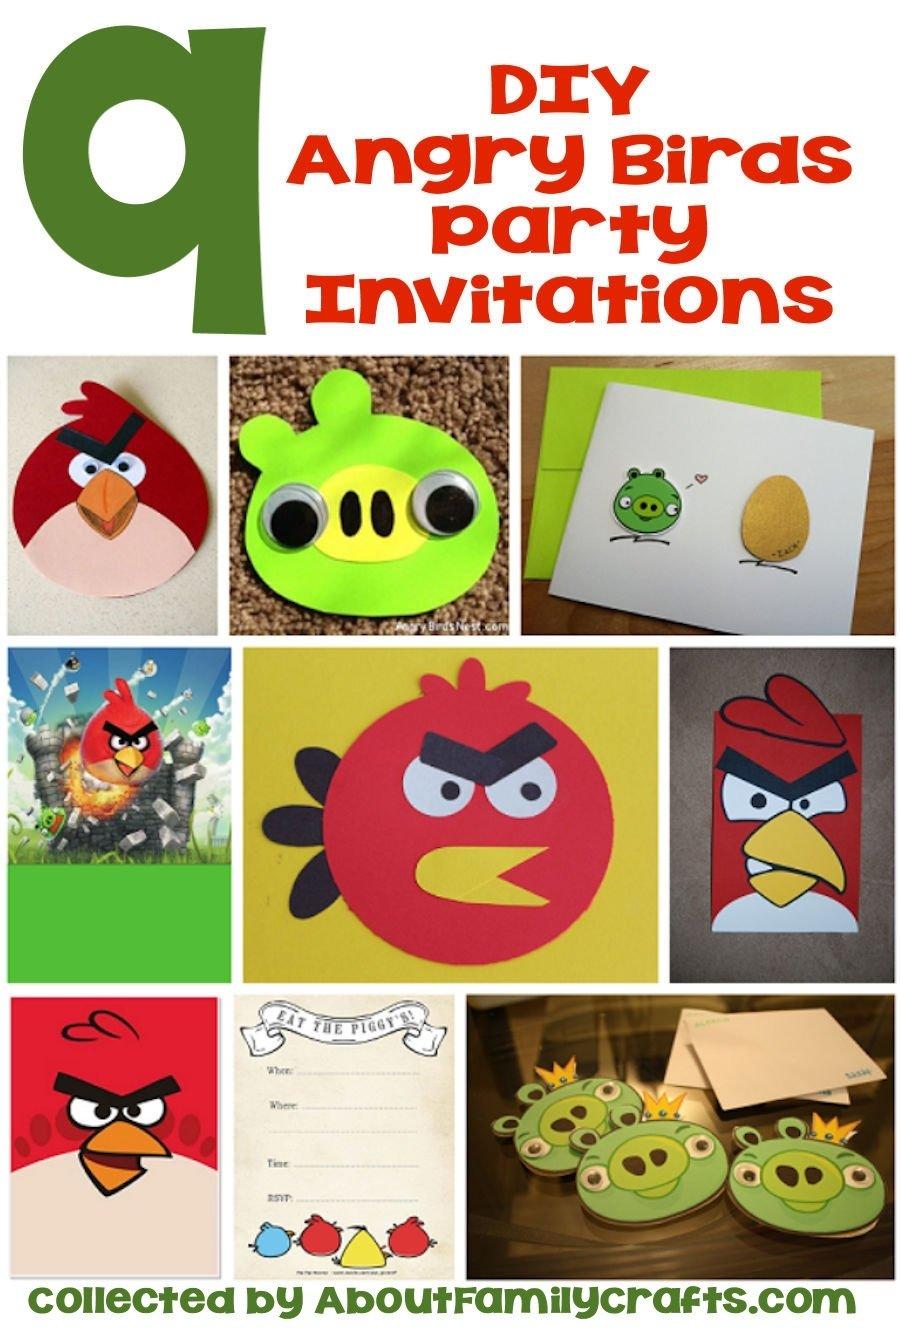 10 Fabulous Angry Birds Birthday Party Ideas 65 diy angry birds party ideas about family crafts 2020